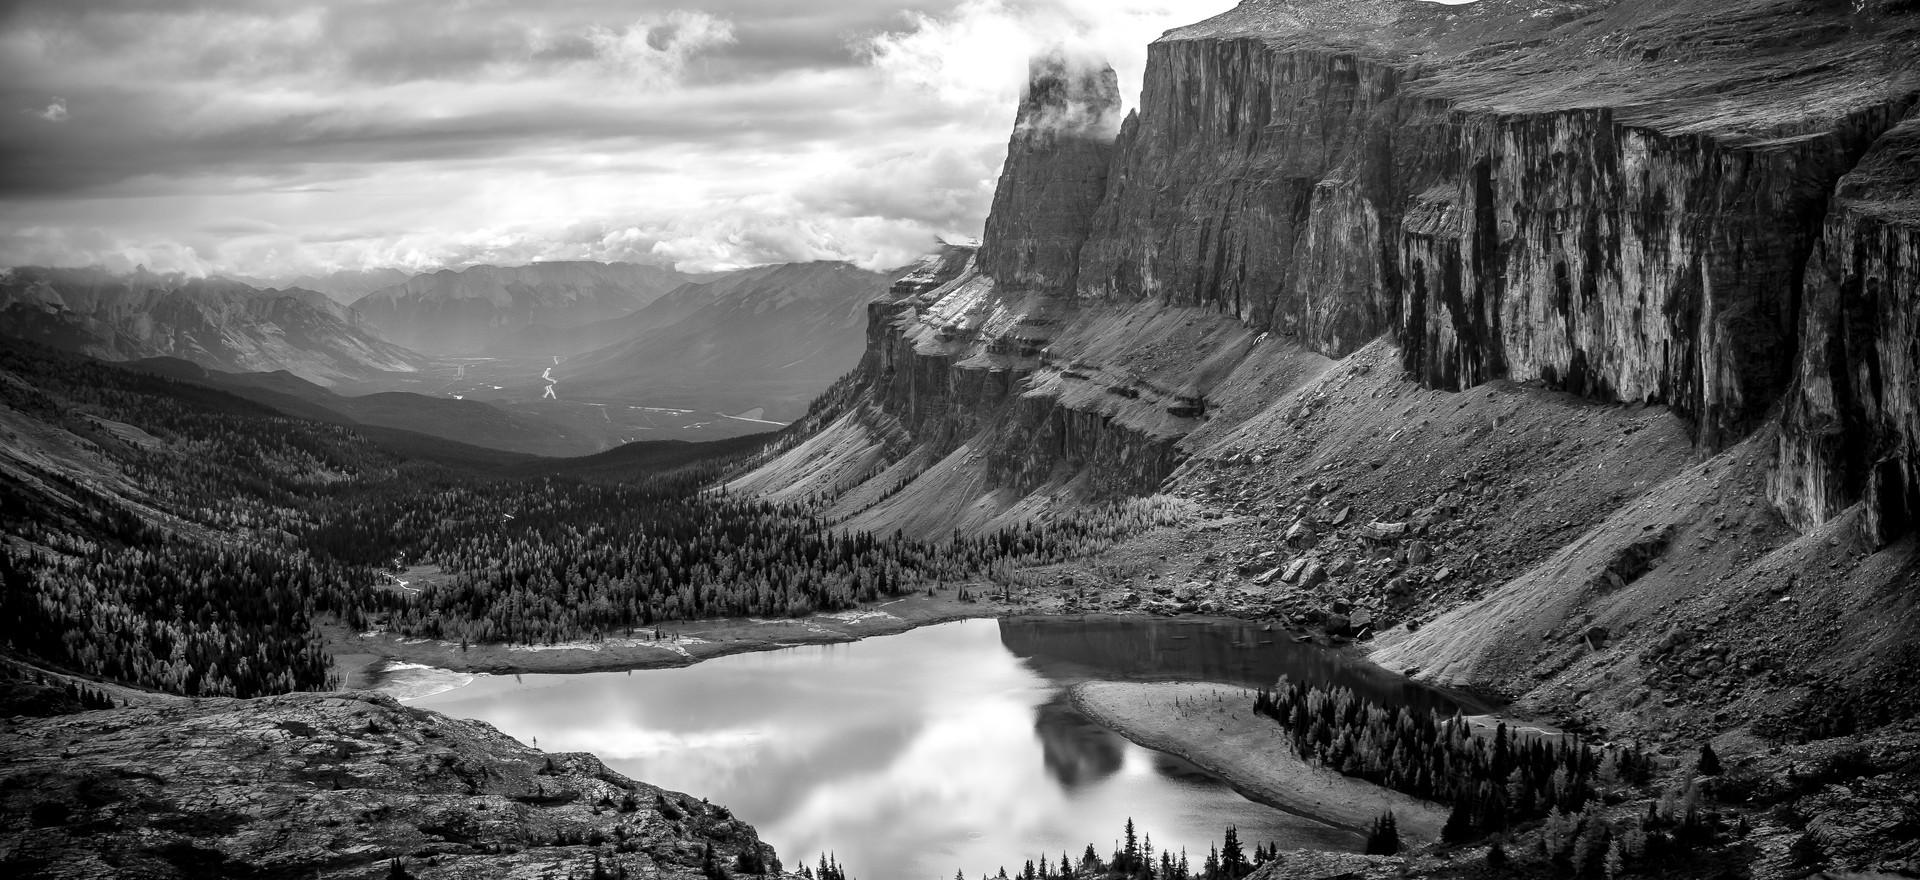 More mountain landscapes